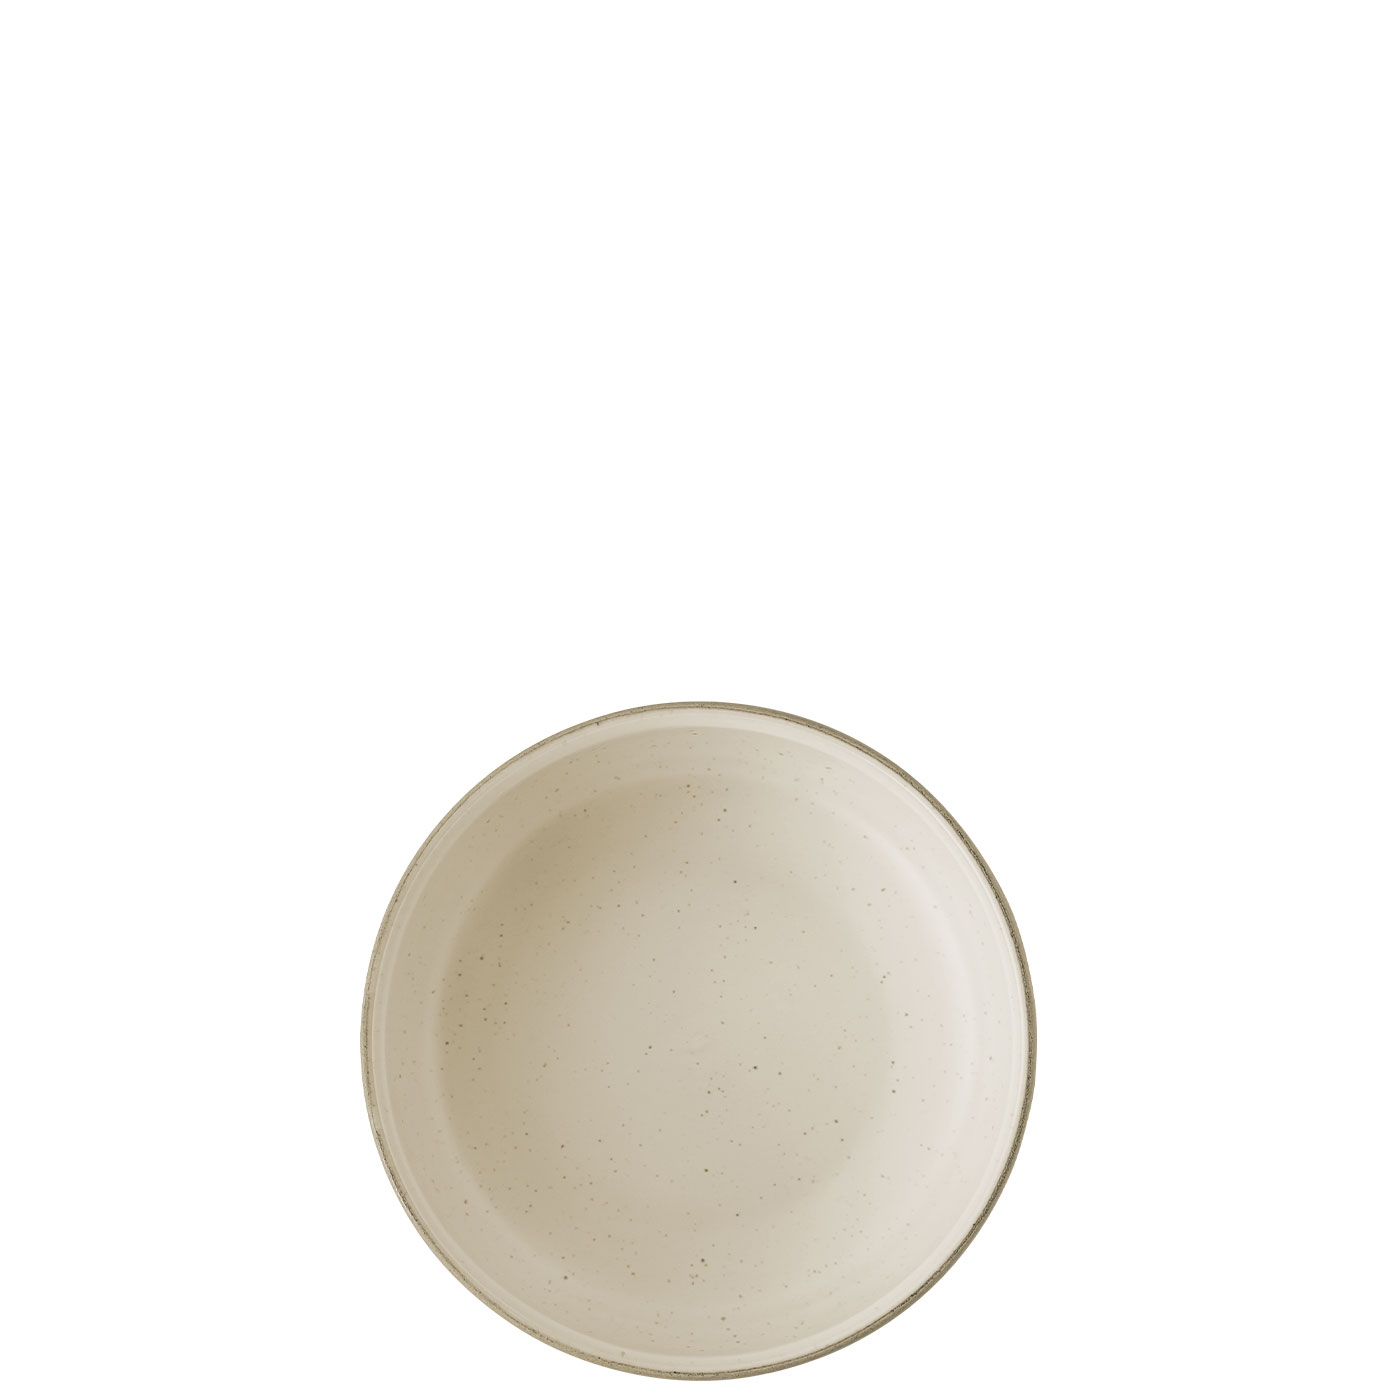 Bowl 16 cm Joyn Stoneware Ash Arzberg